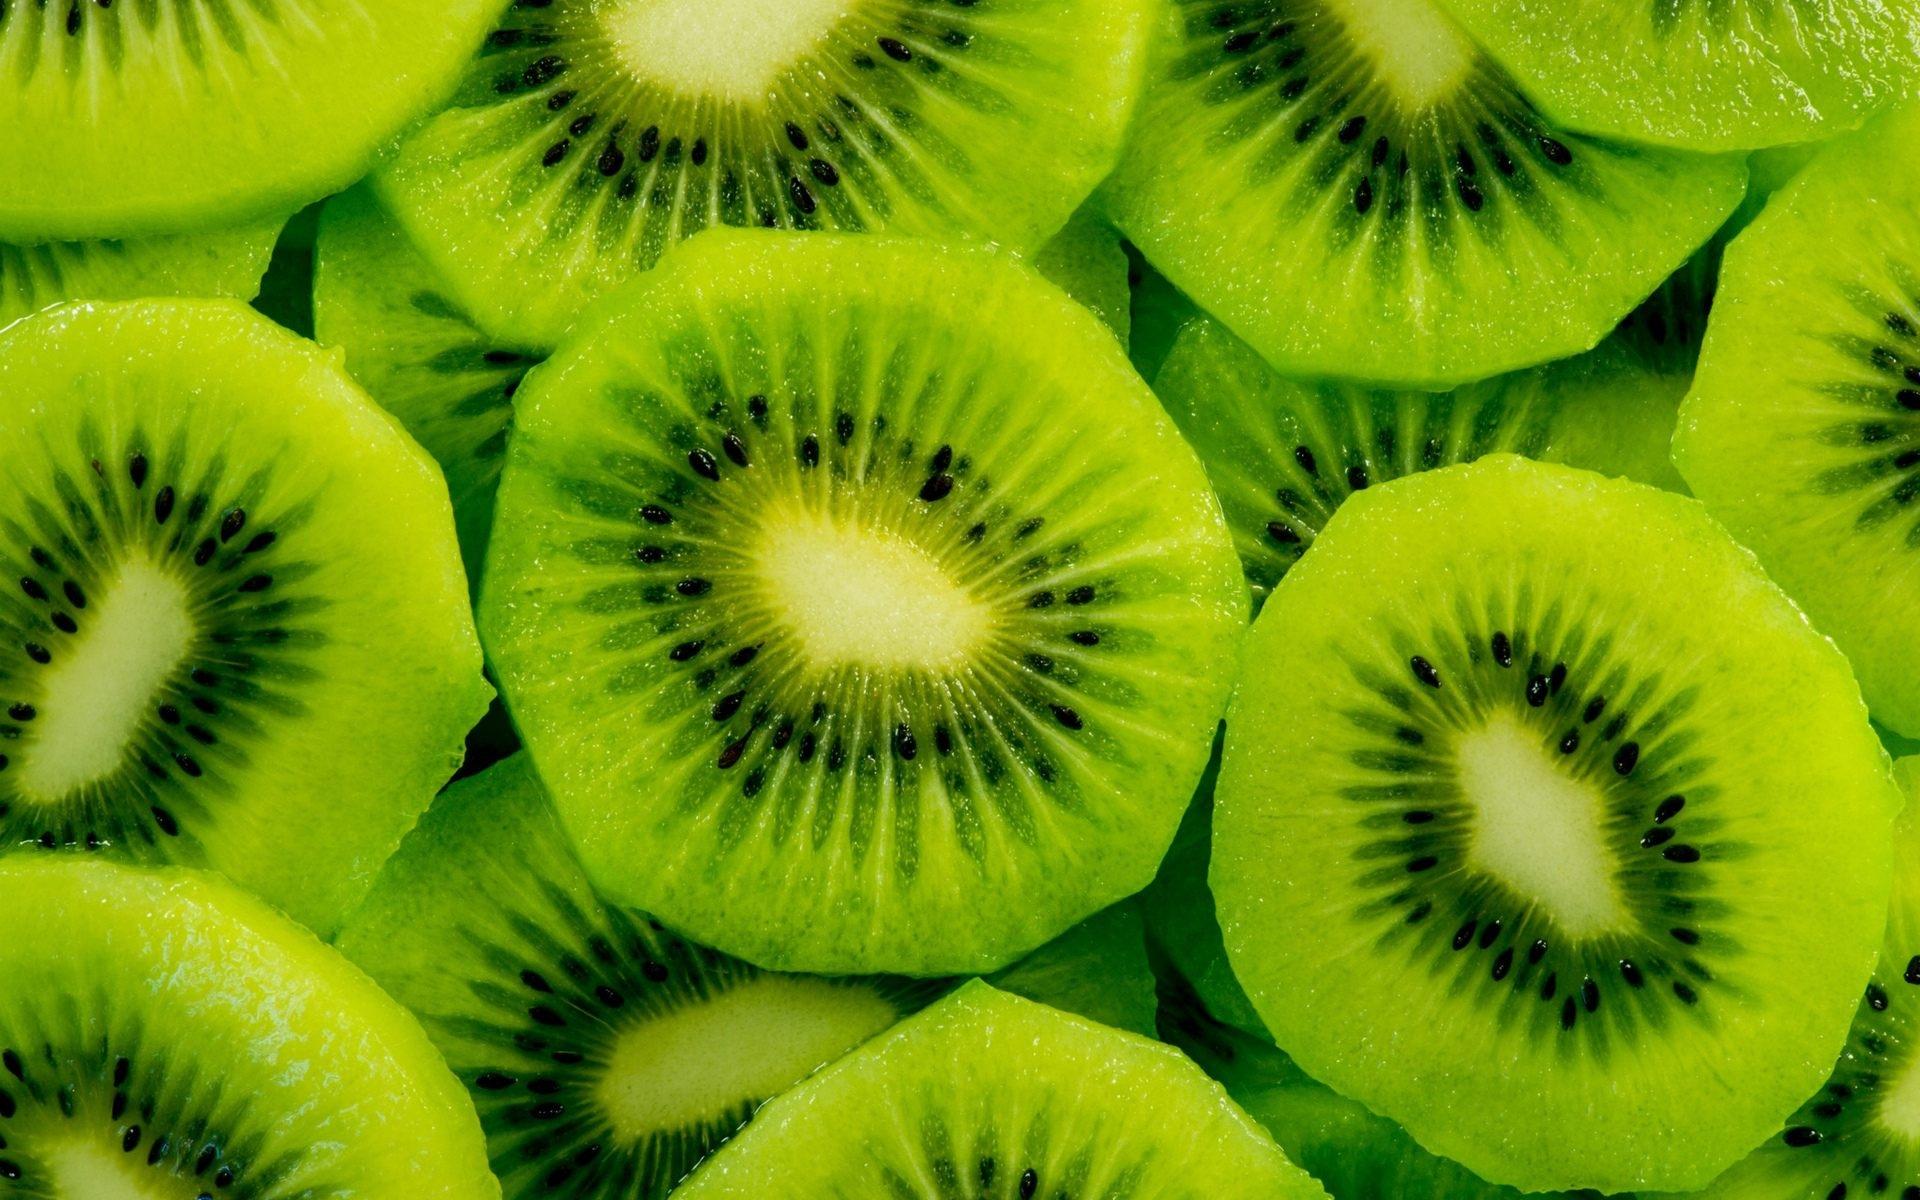 Green kiwi fruit slices wide wallpapers HD Wallpapers Rocks 1920x1200